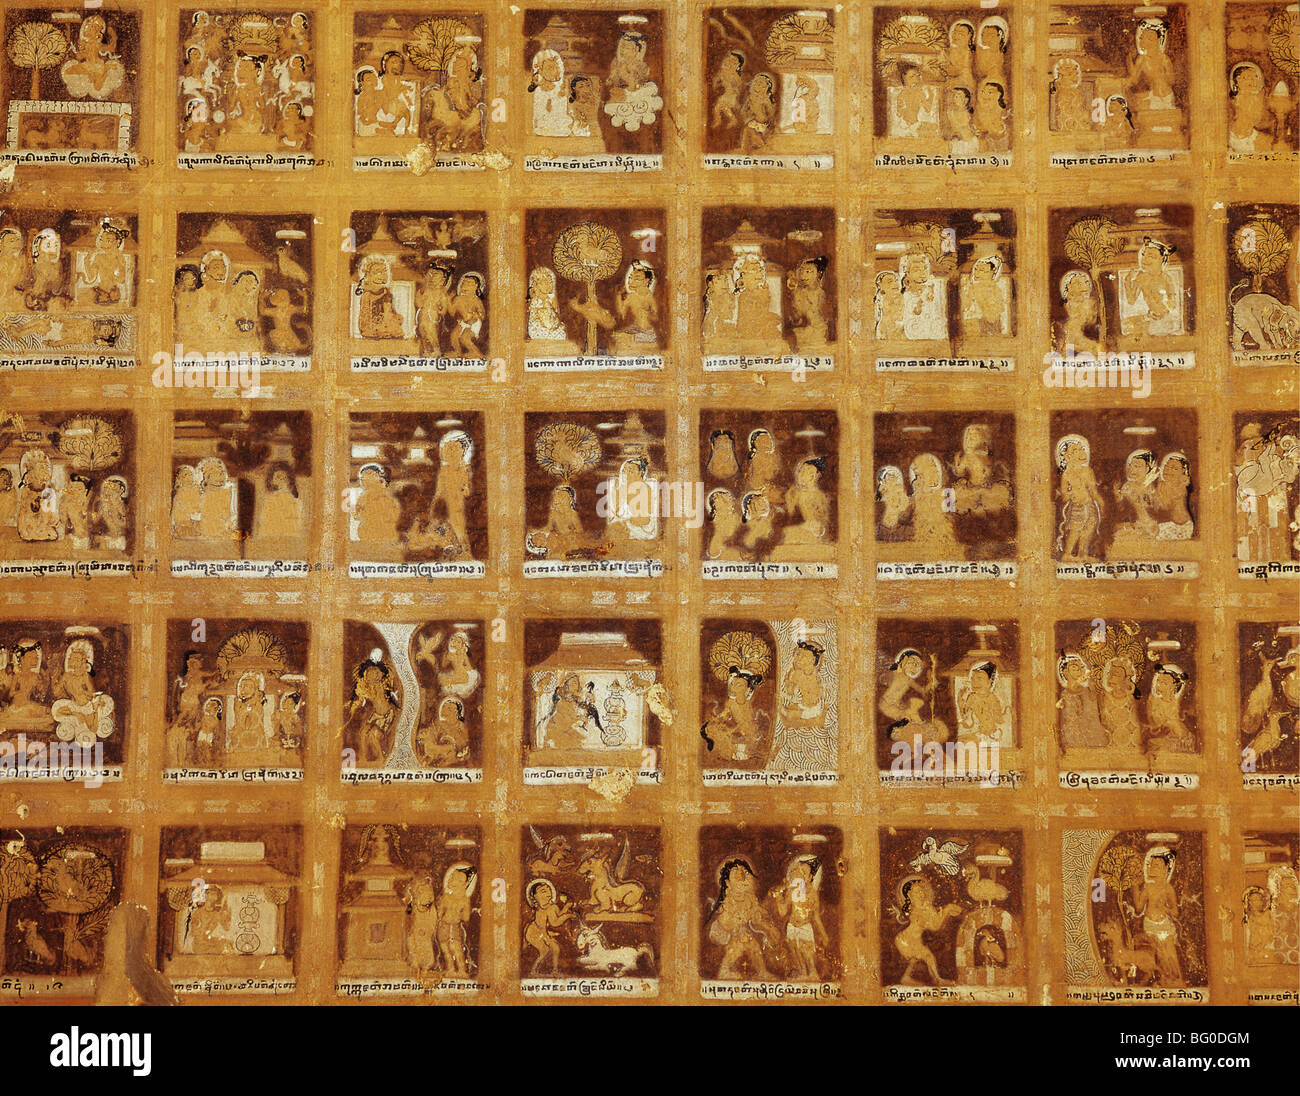 Jataka Scenes on the ceiling at Kubyauk Gyi (Wetkyi-In), Bagan (Pagan), Myanmar (Burma), Asia - Stock Image